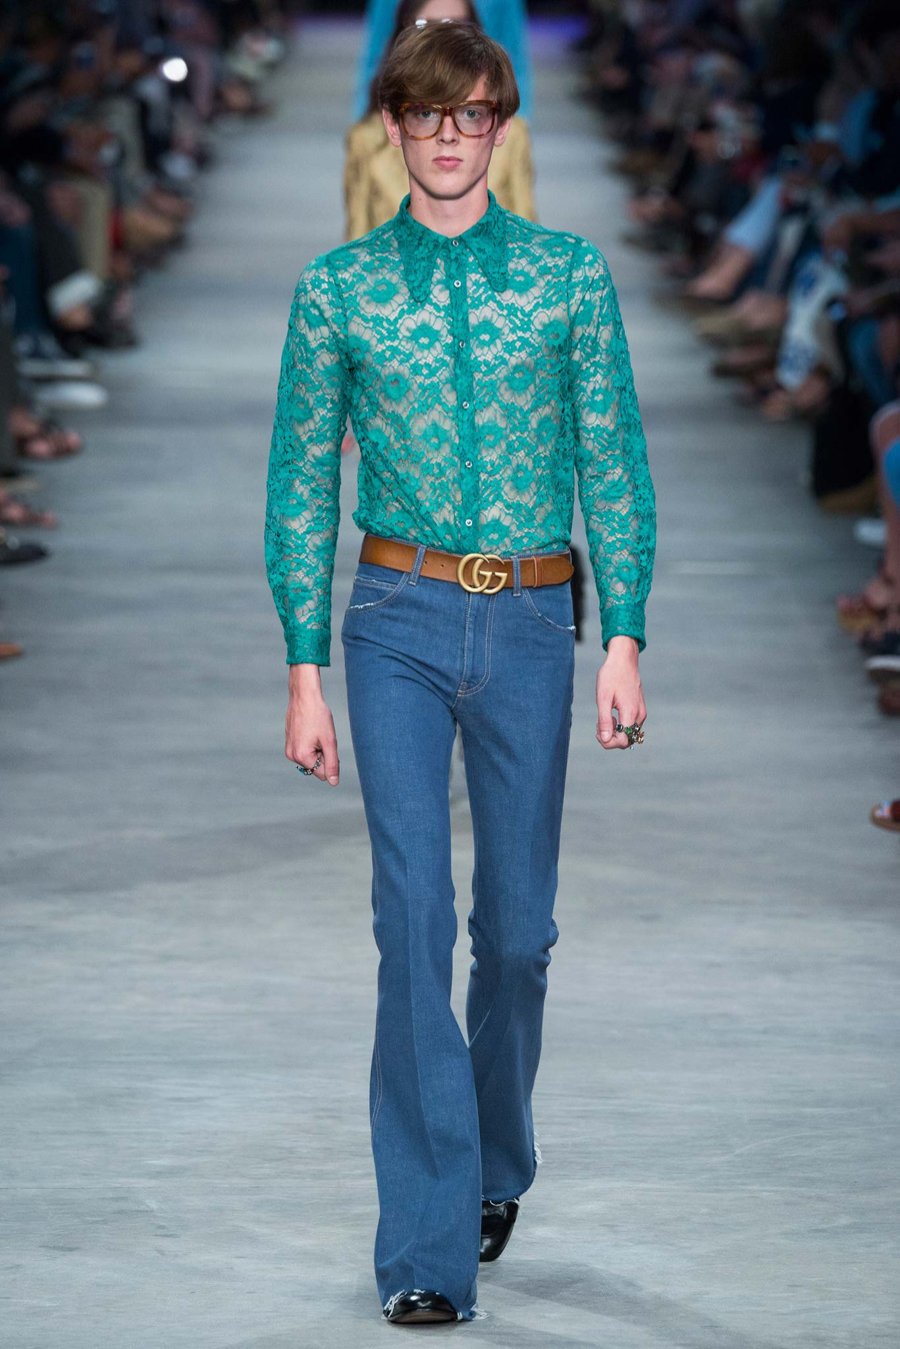 Trendy Shirts For Men